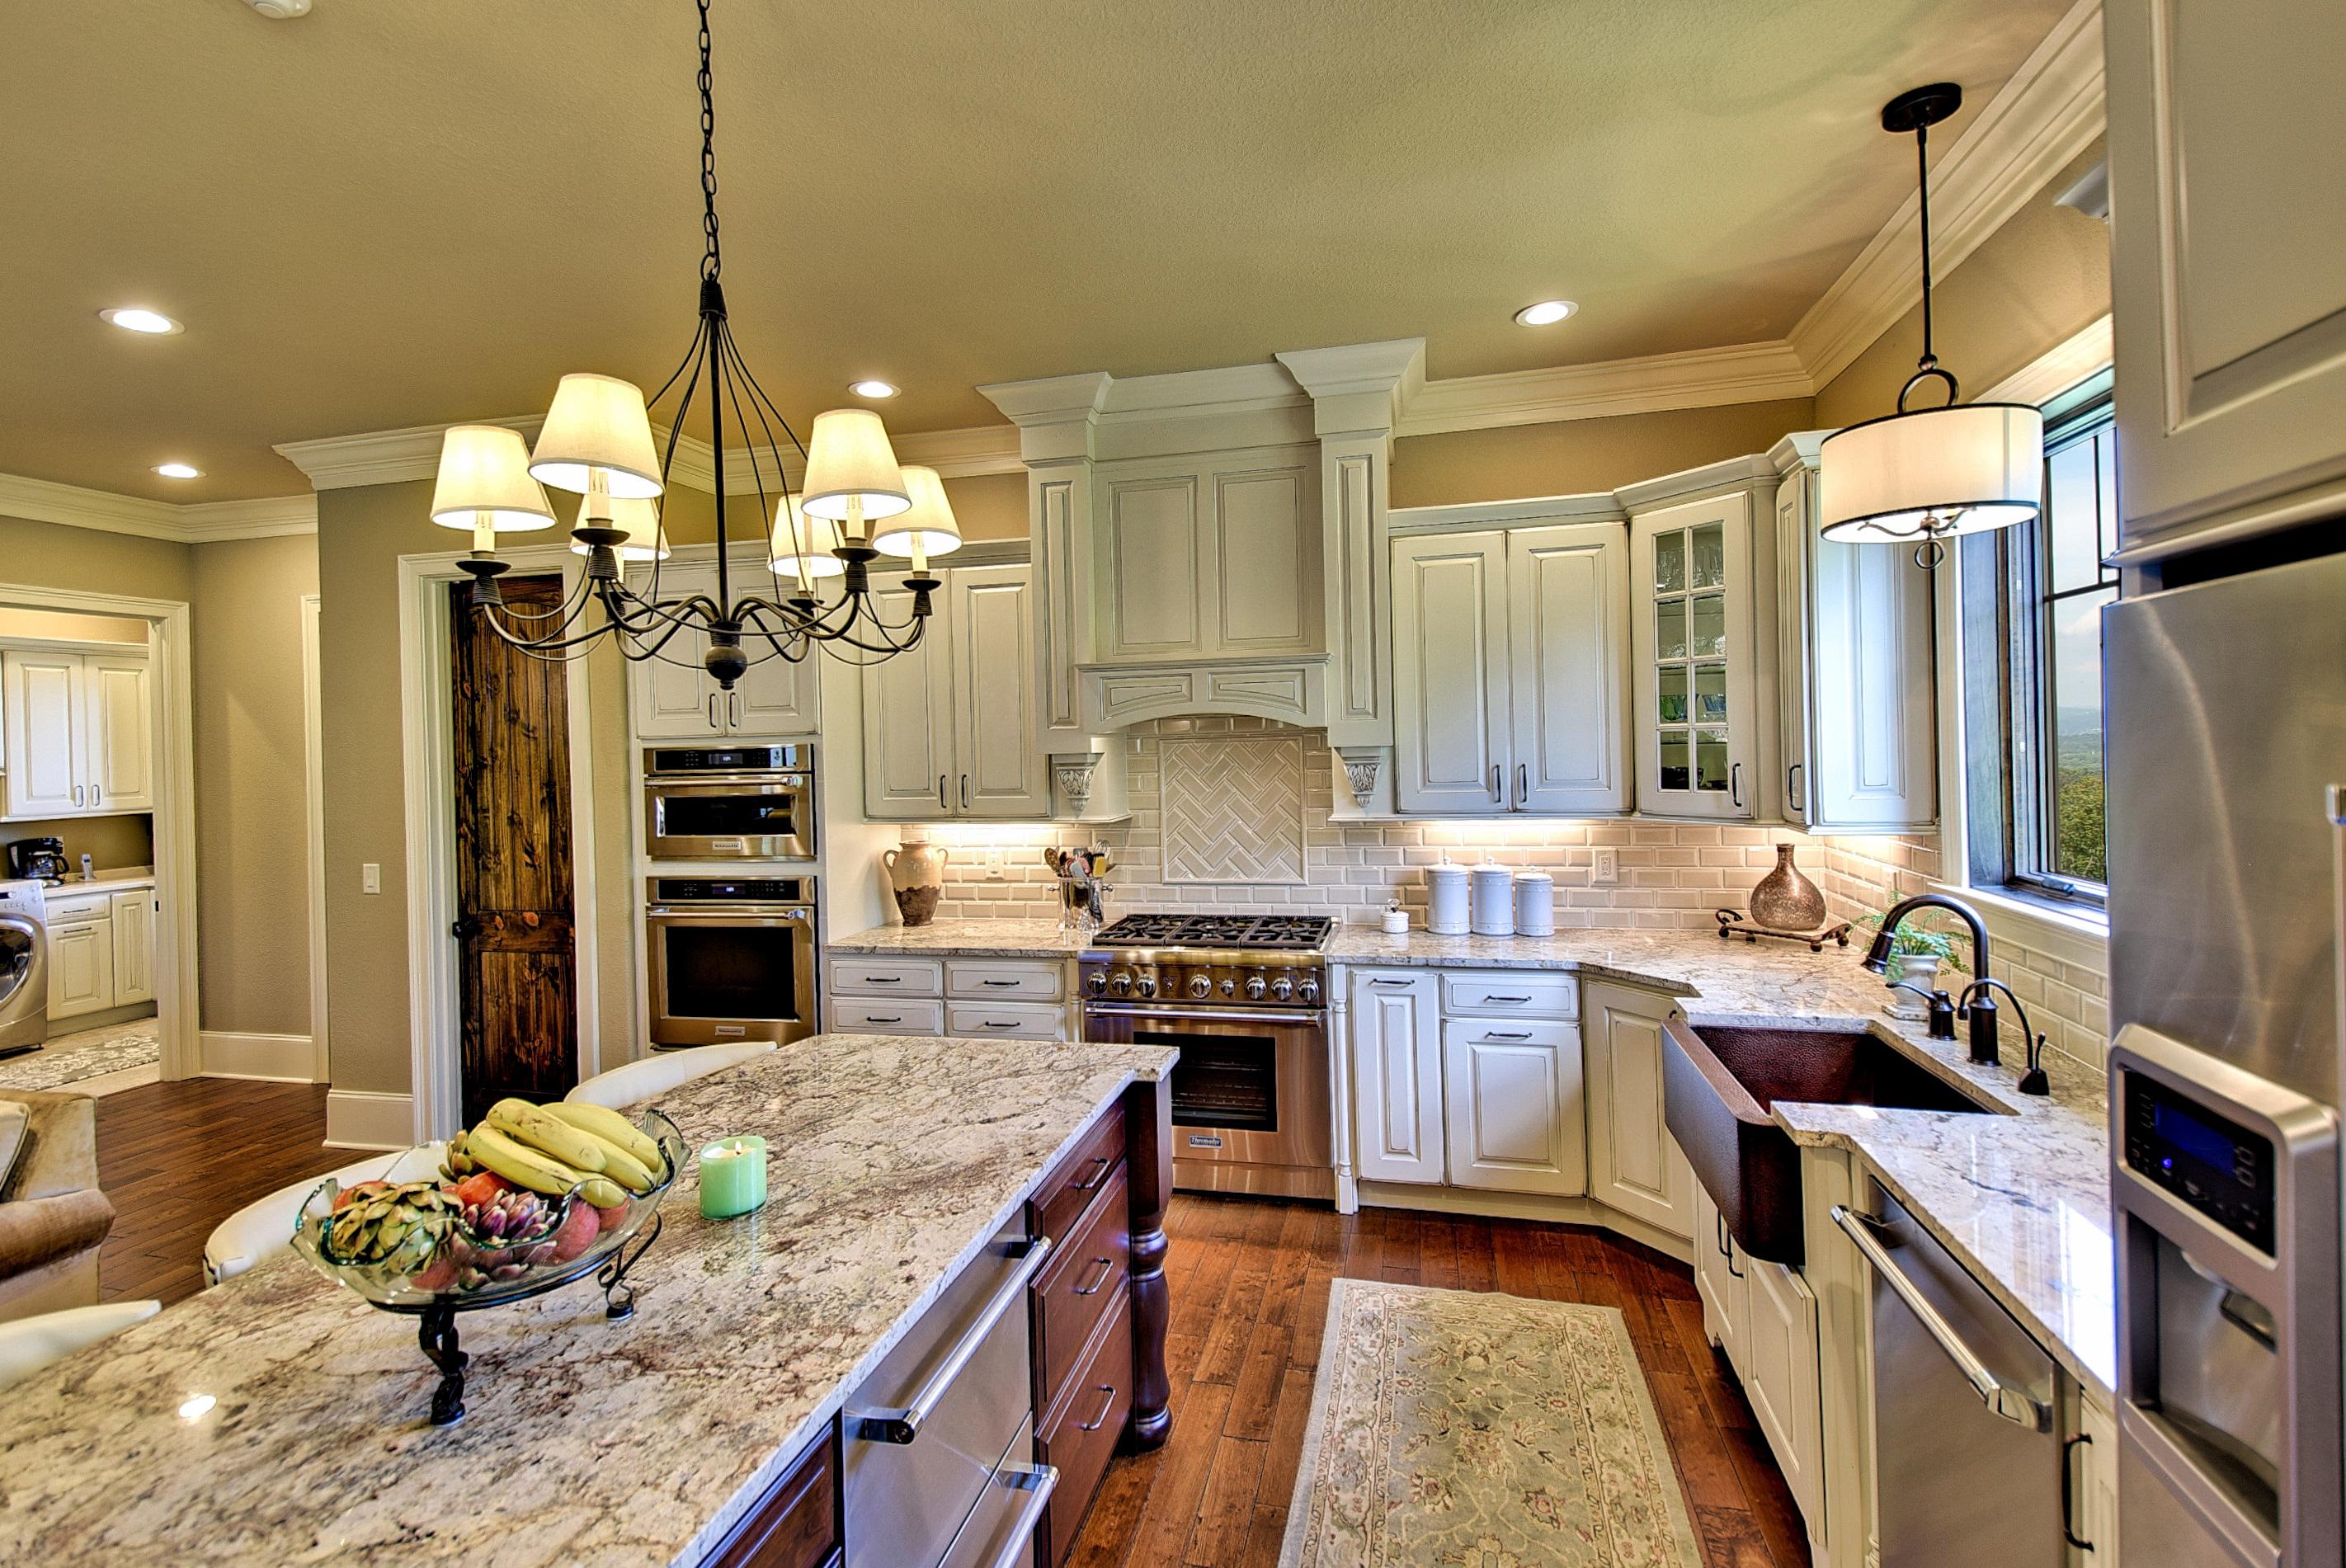 Johnson City Cabinet Retailer - Kitchens By Design